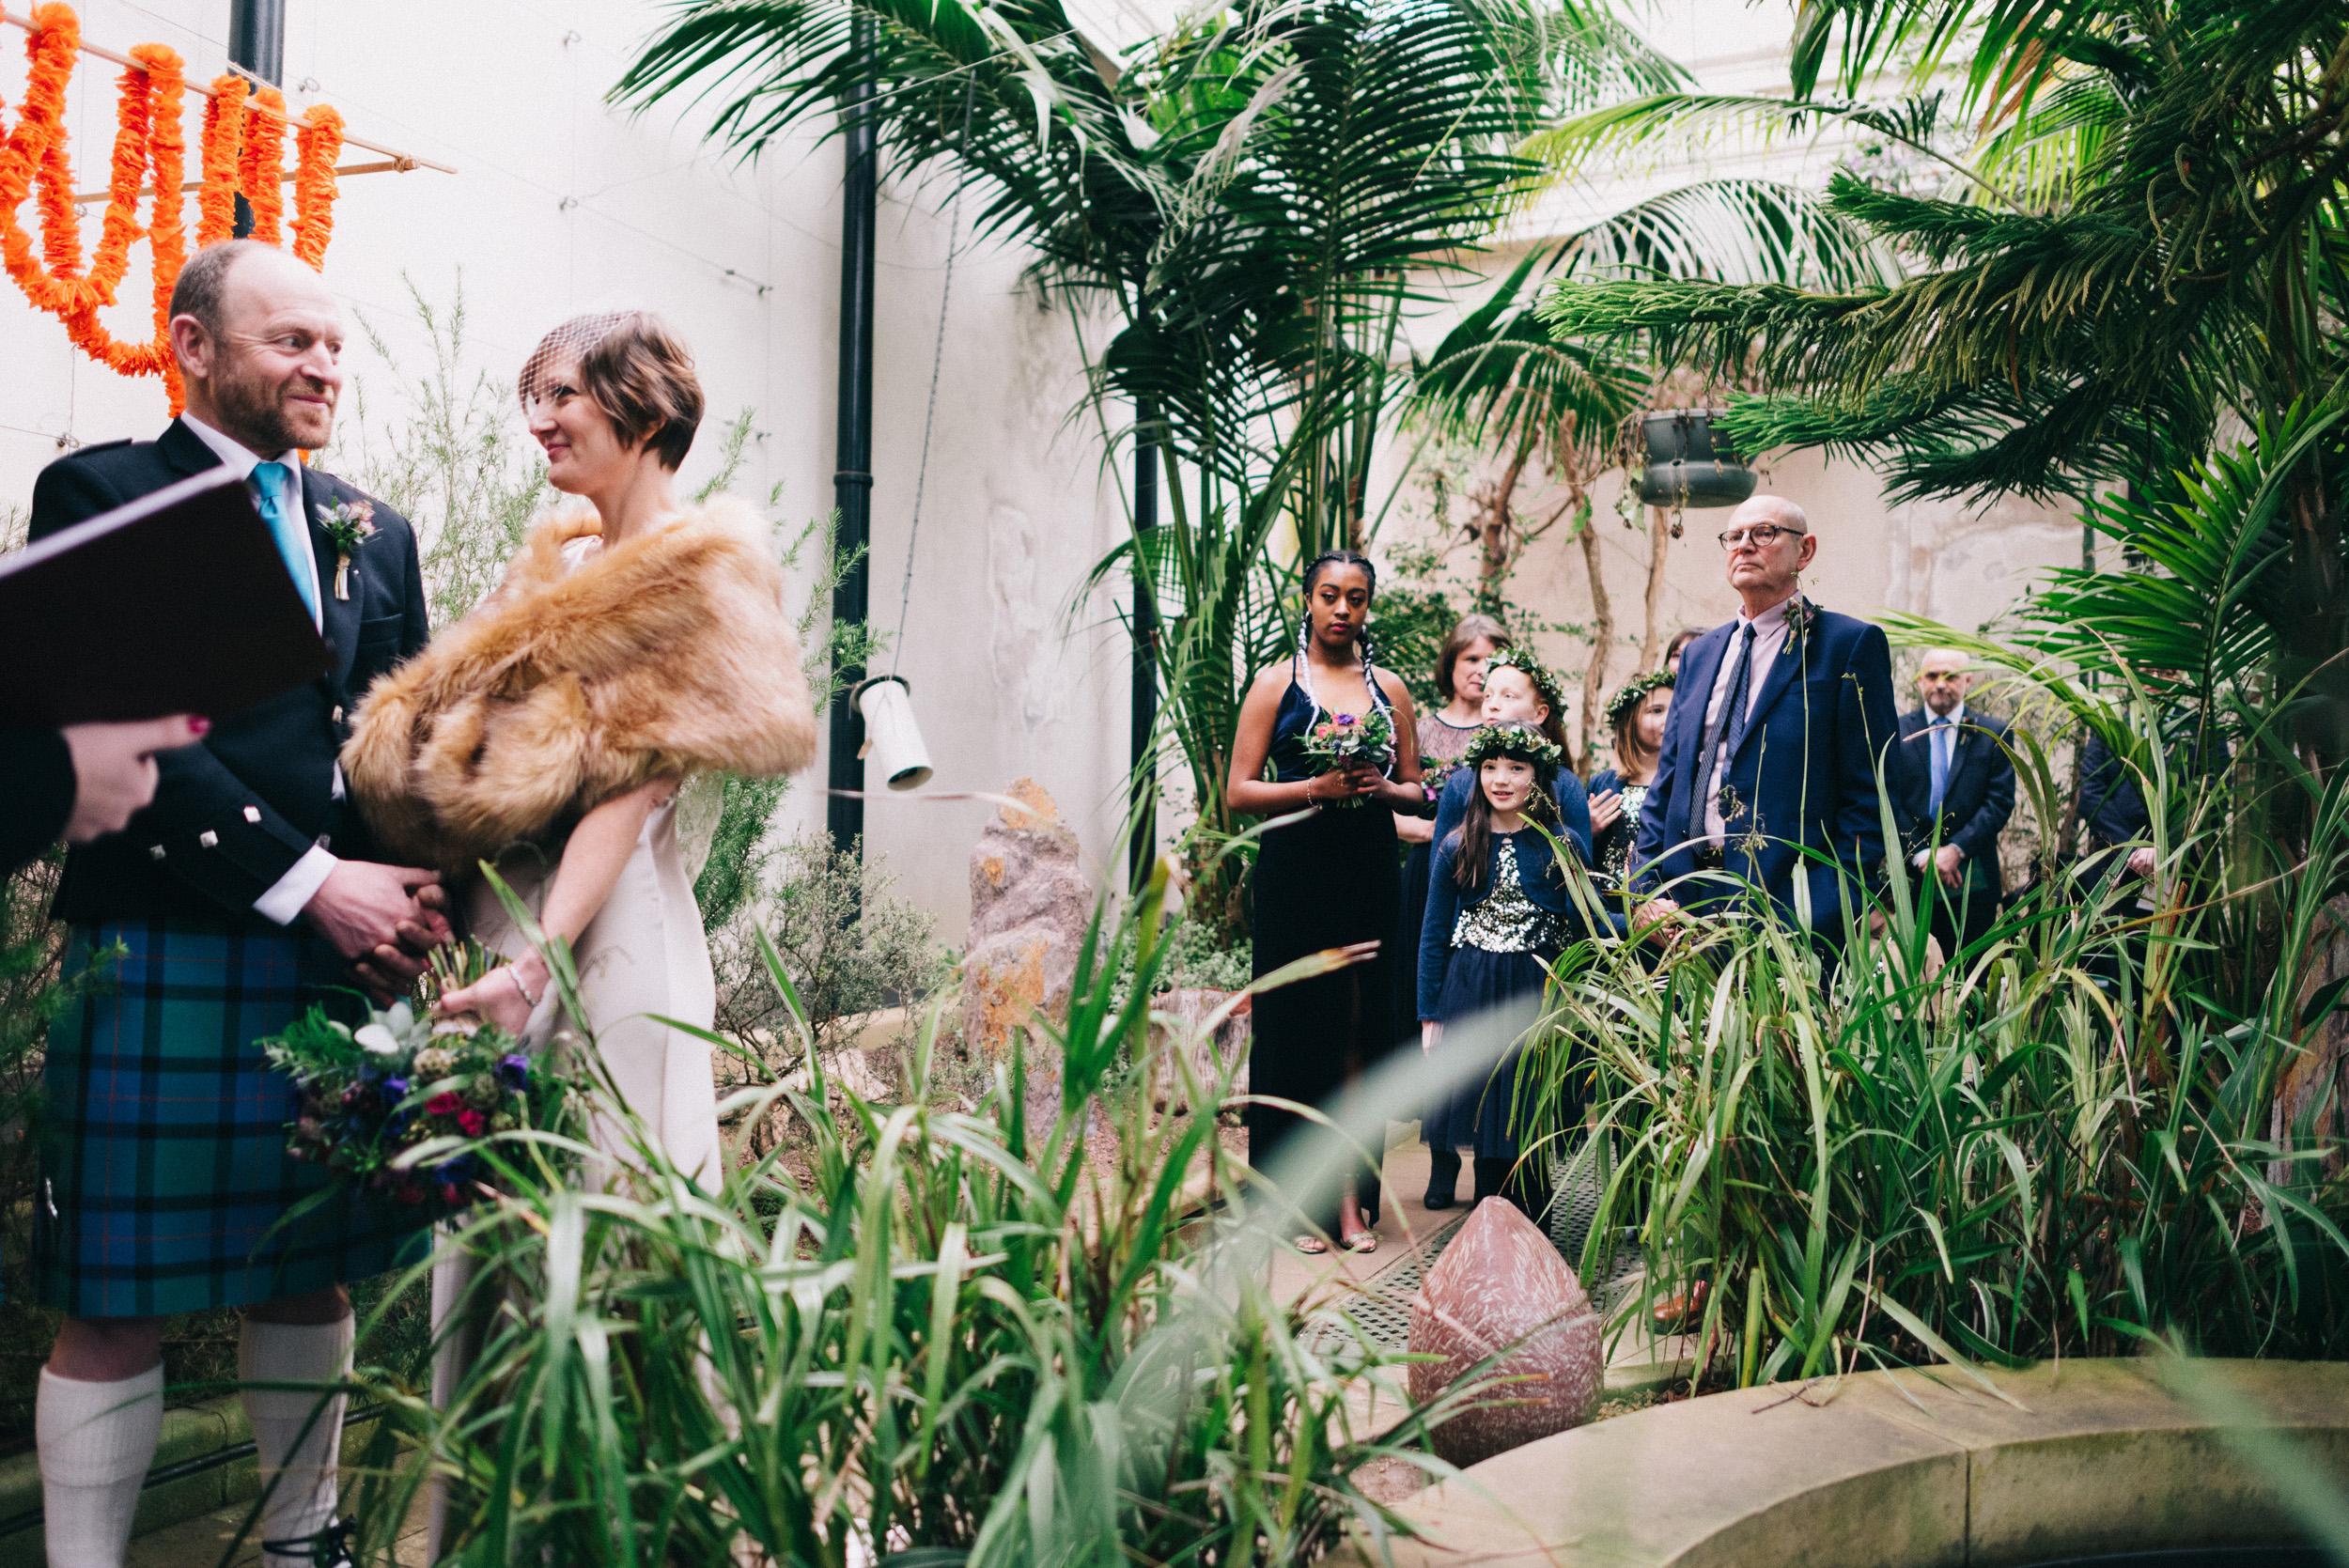 Alice-Bias-Cut-Silk-Wedding-Dress-Kate-Beaumont-Sheffield-Botanical-Gardens-by-Peakography-9.jpg